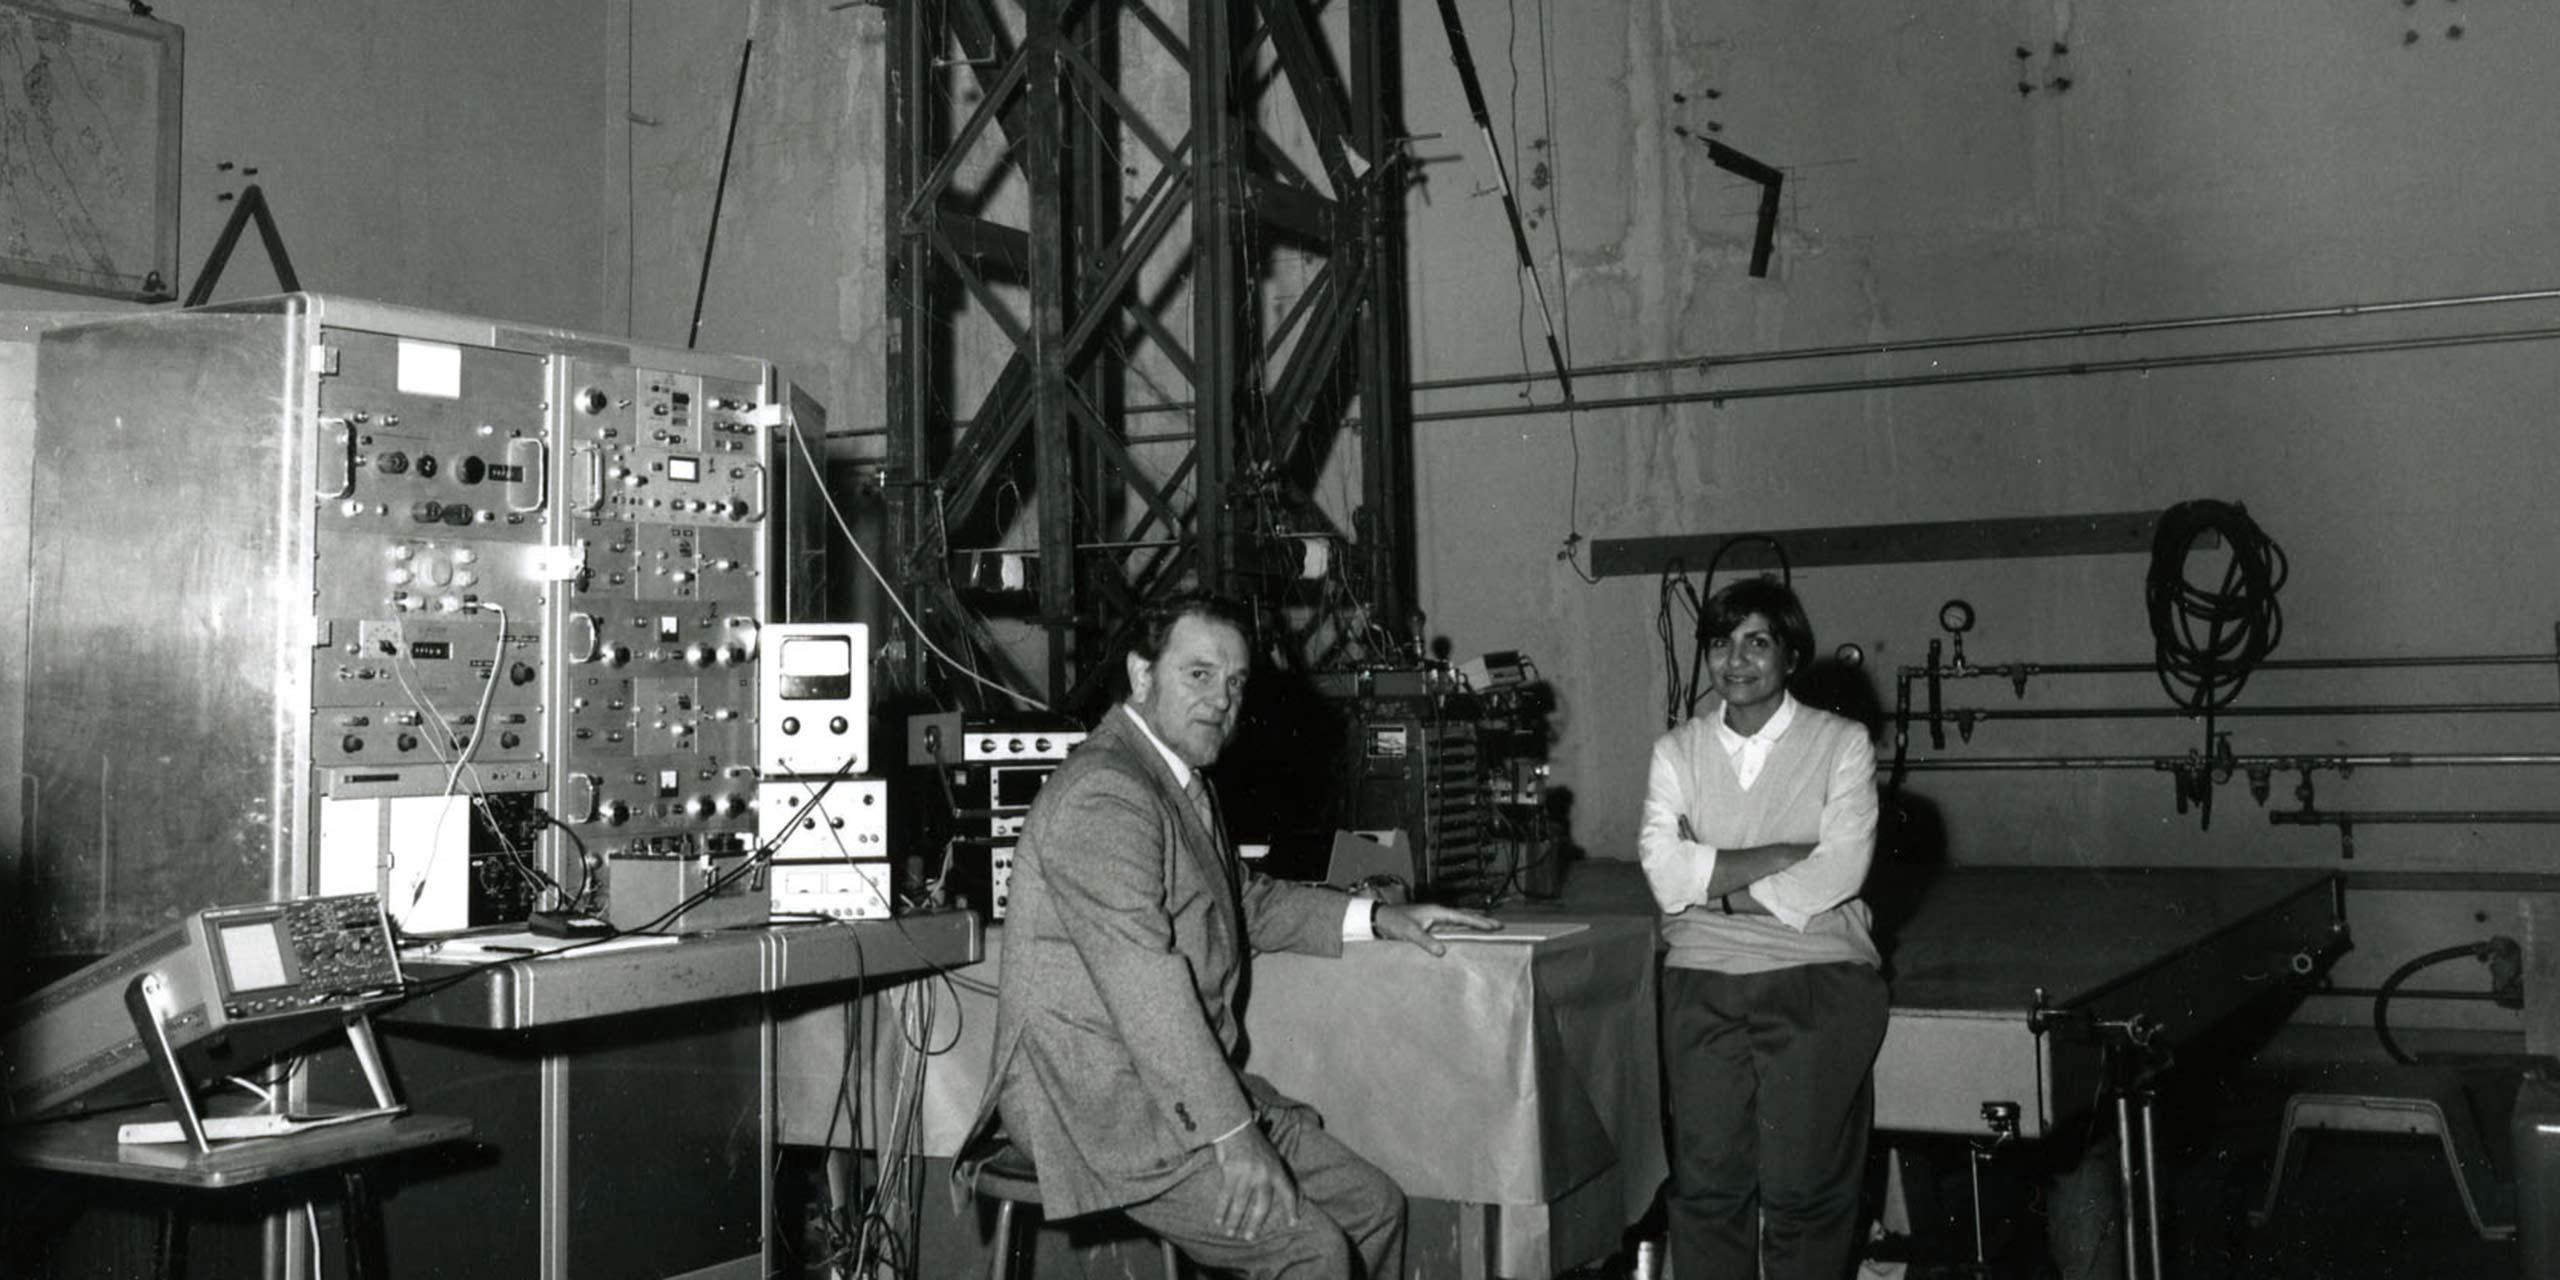 Gina Cody and Cedric Marsh at Concordia in 1985. © Concordia University